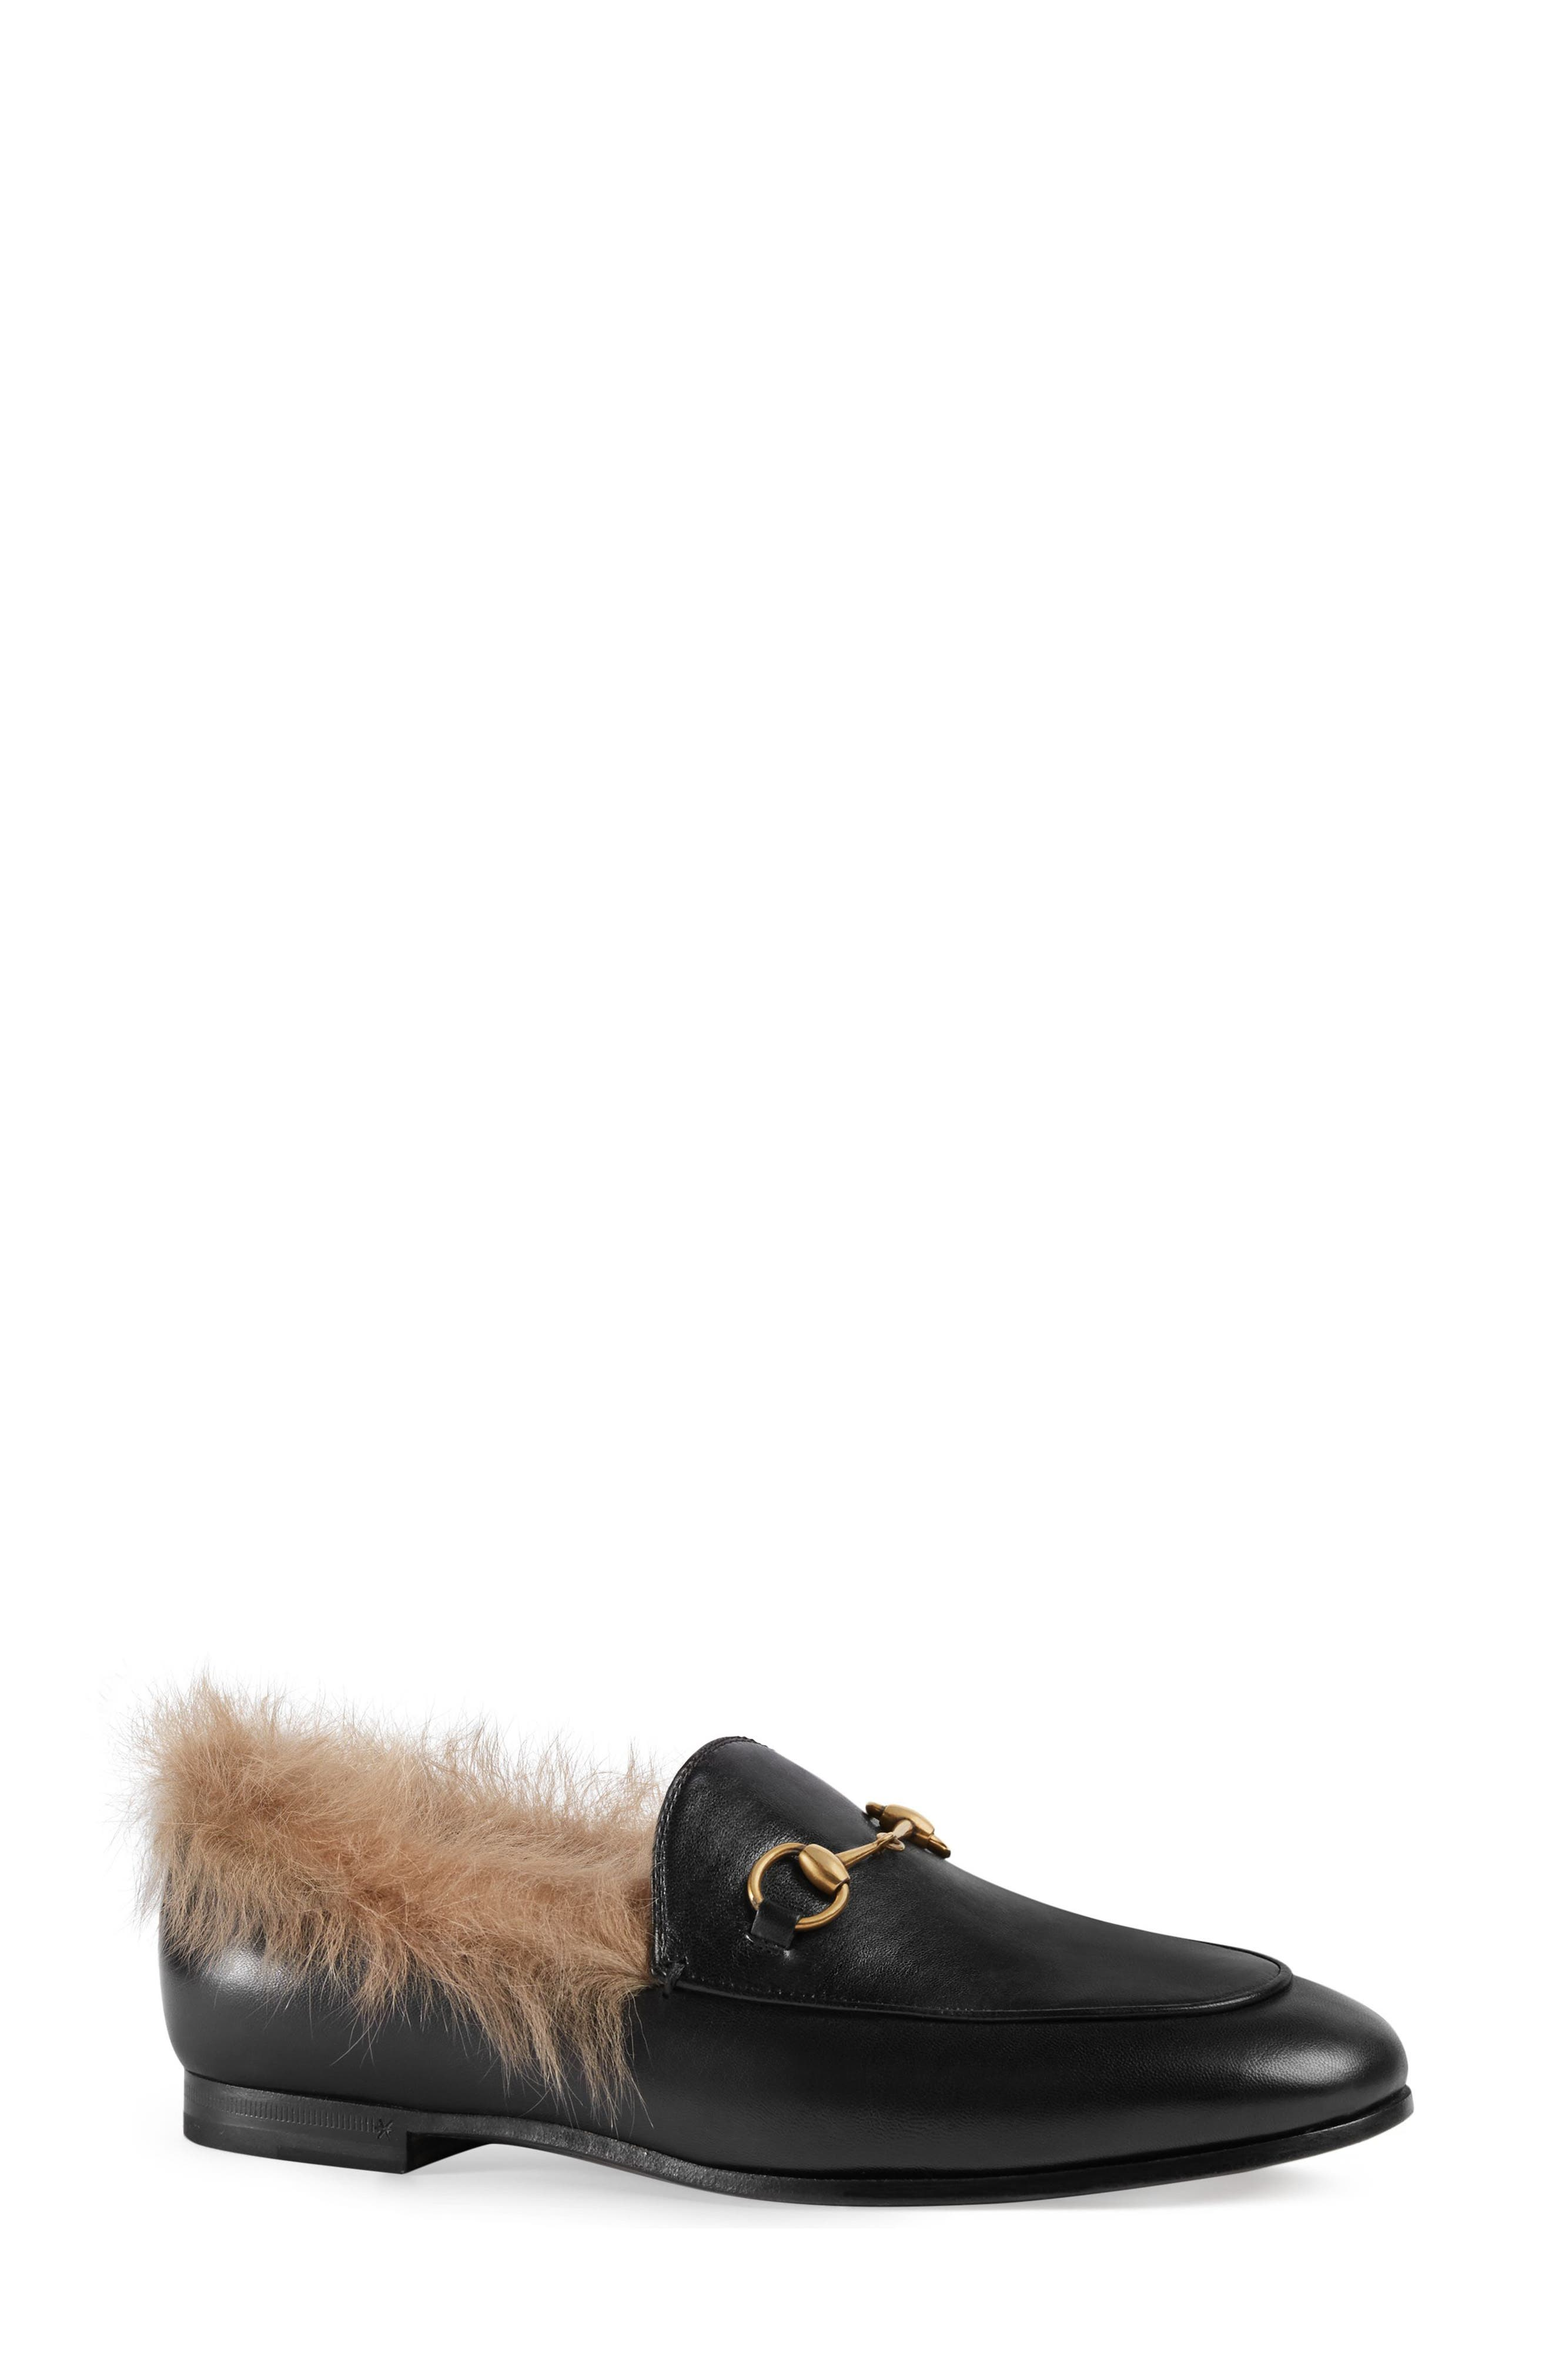 Jordaan Genuine Shearling Lining Loafer,                         Main,                         color, Black